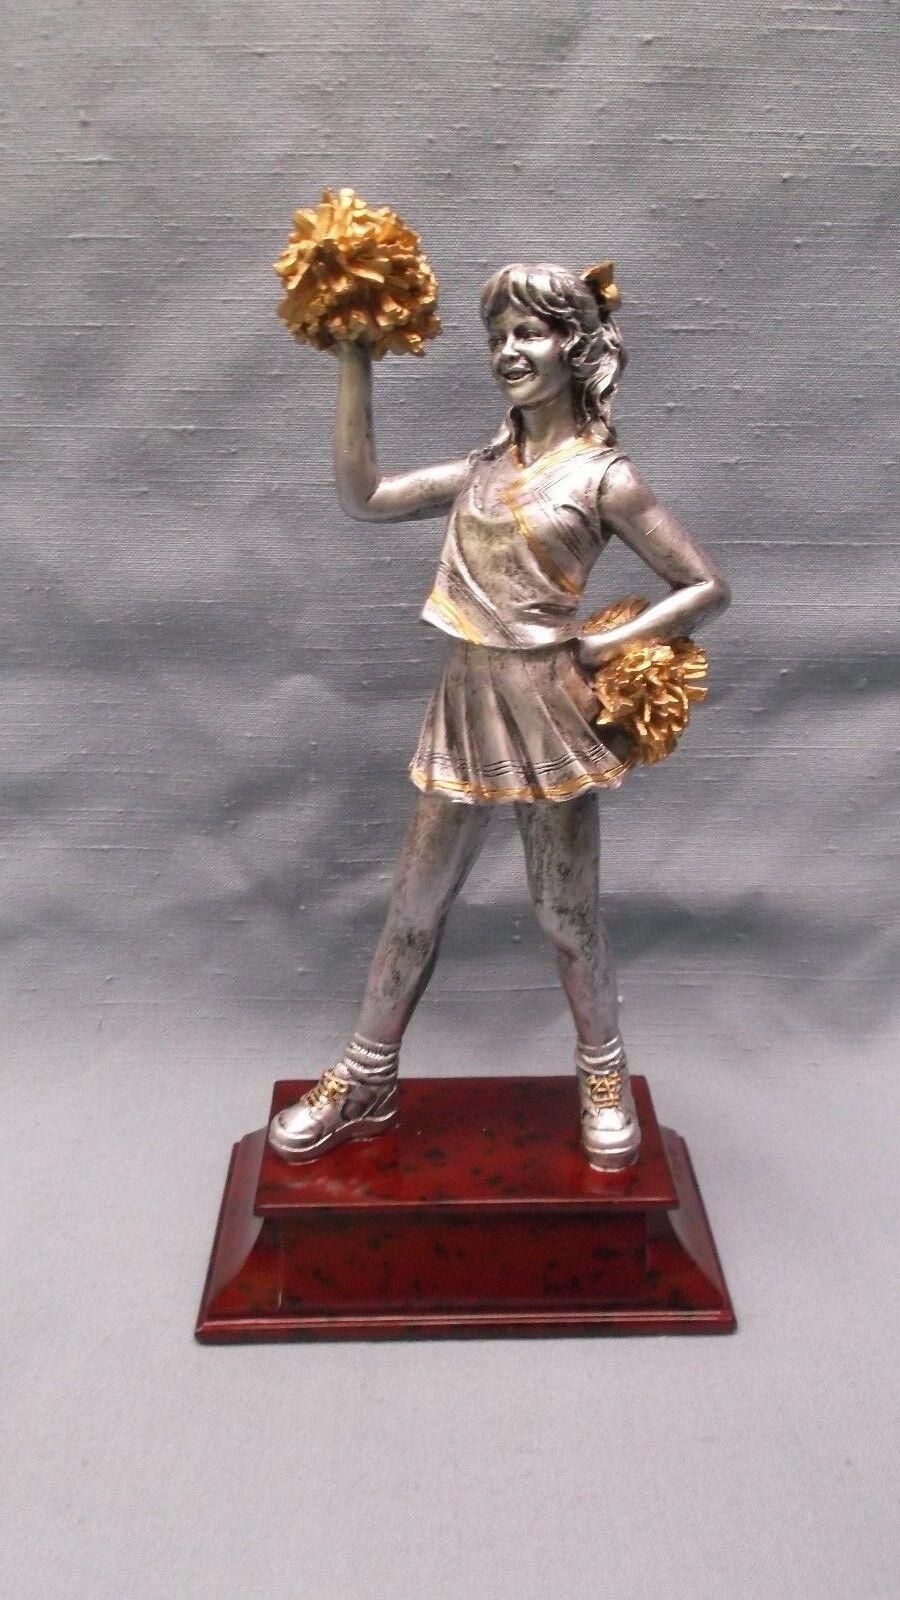 Team lot of 10 CHEERLEADING statue trophies resin PDU 57506GS